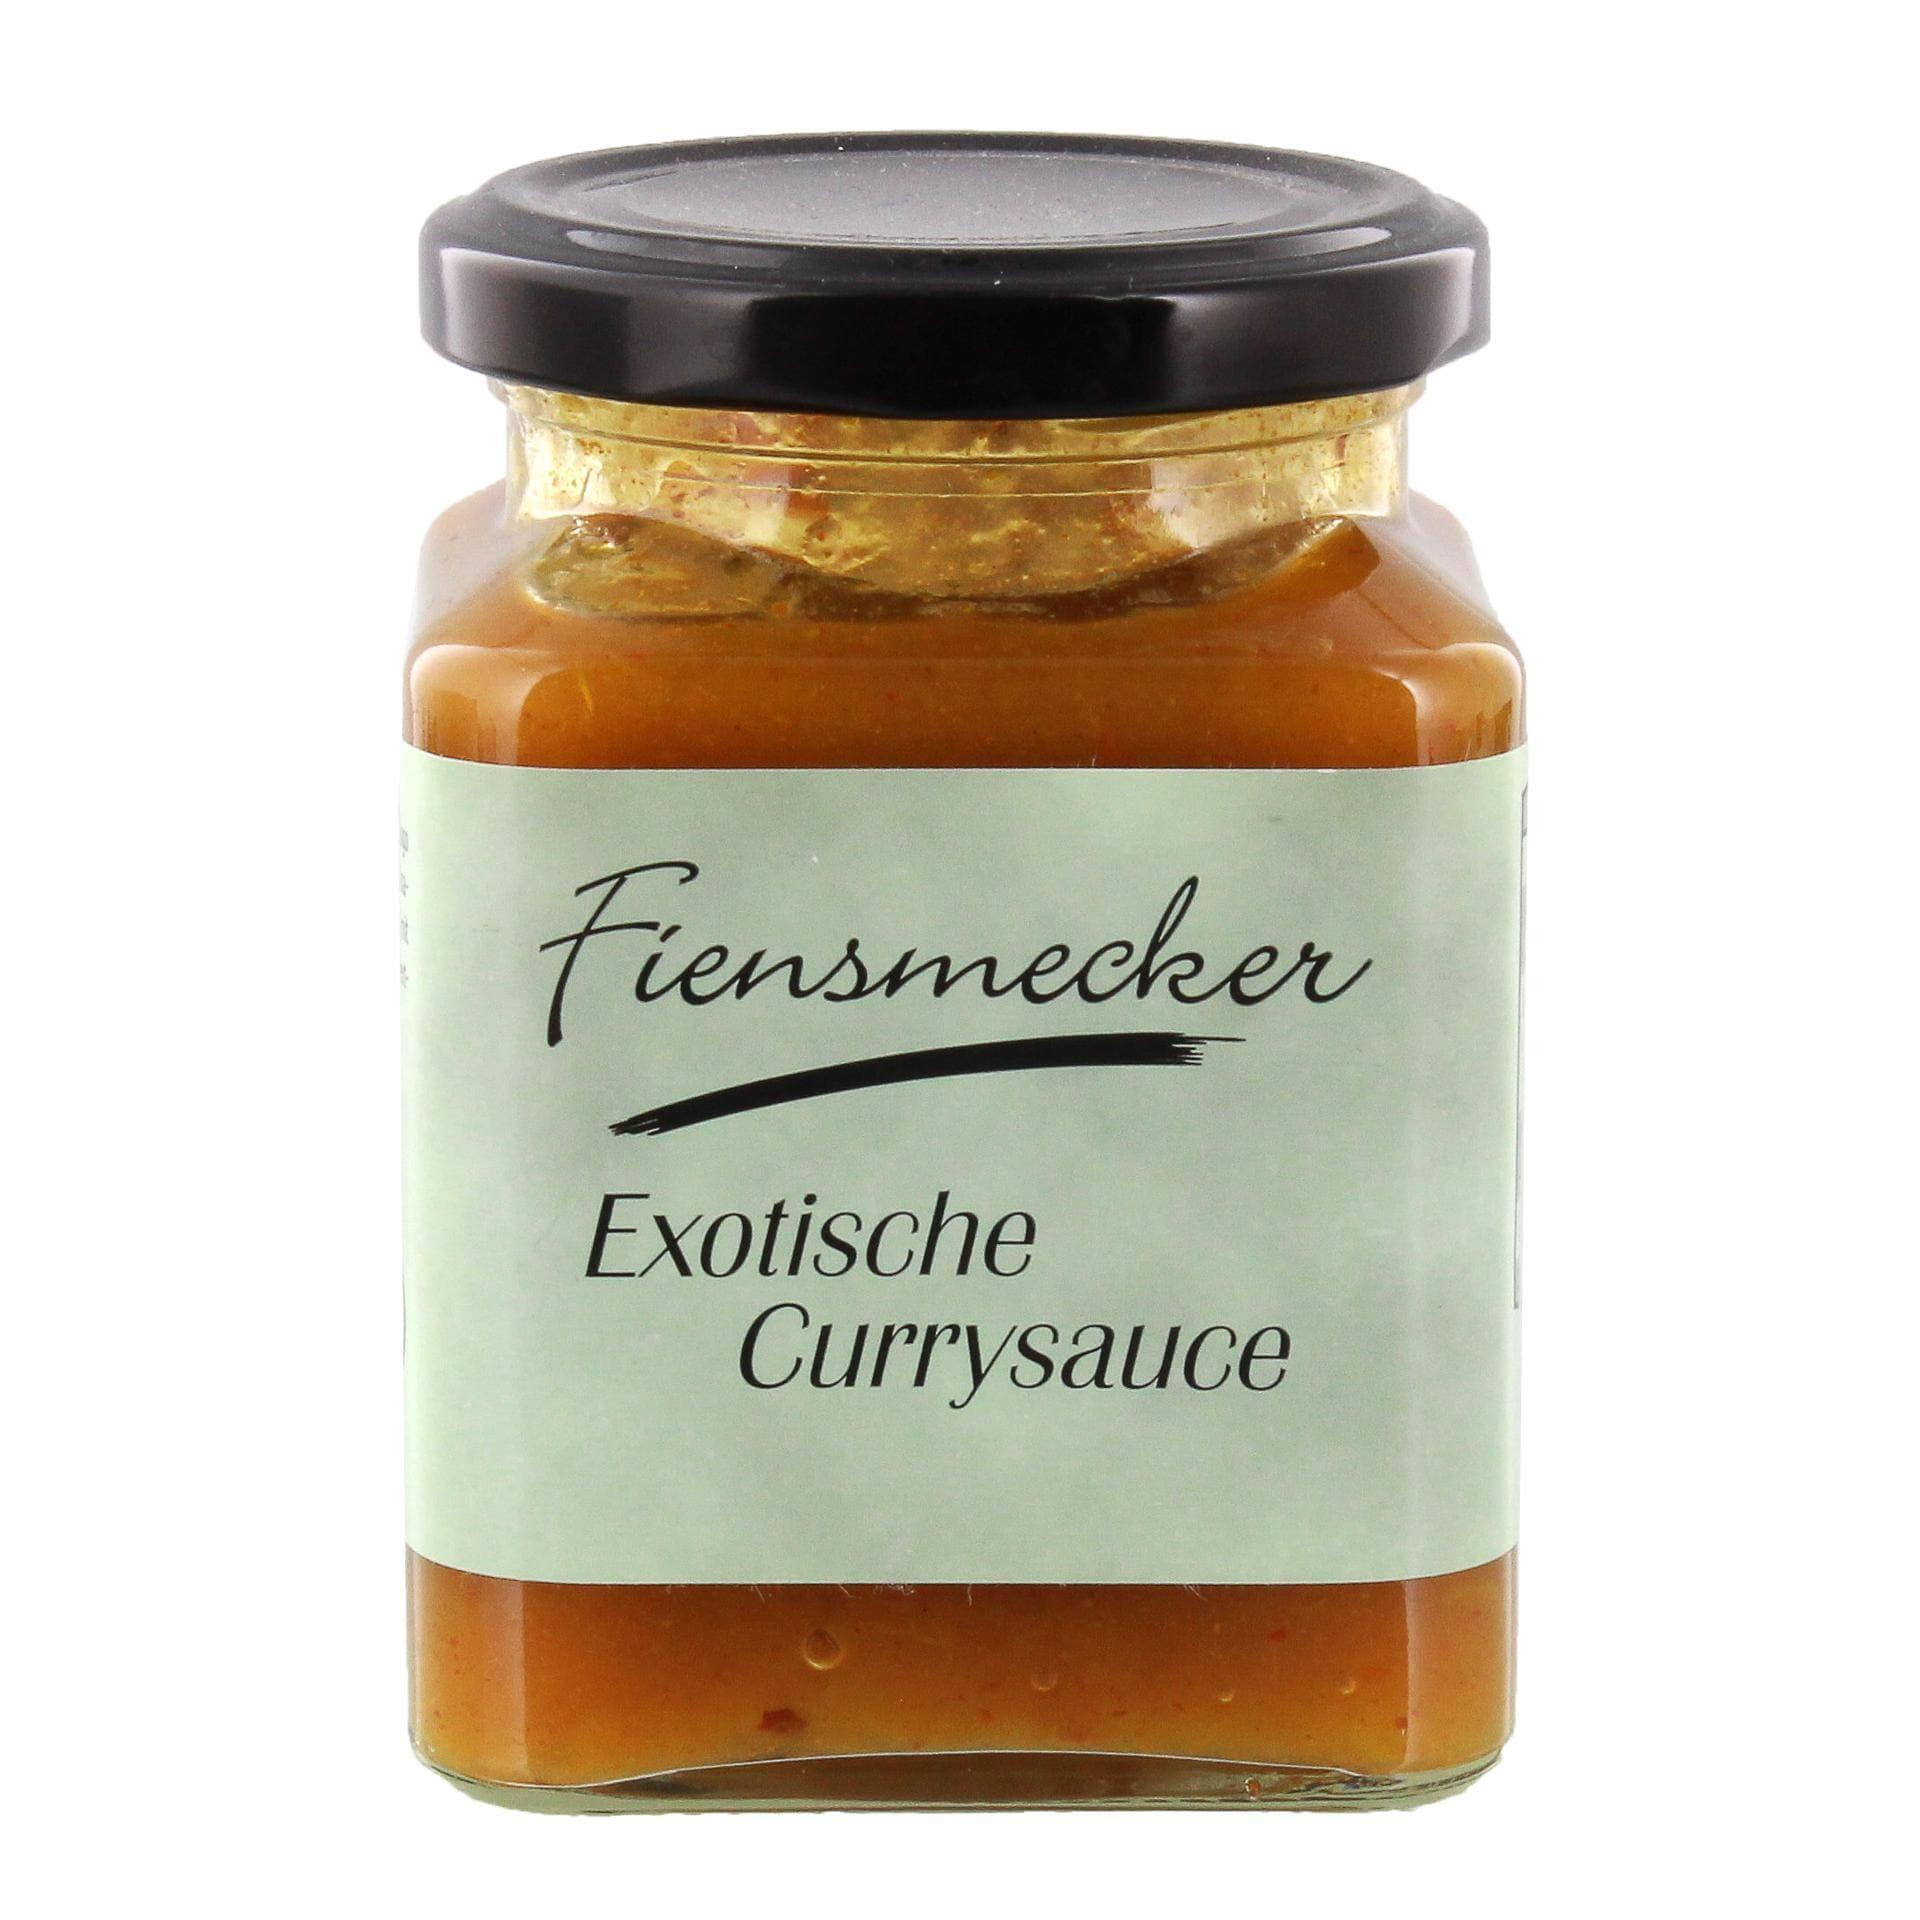 Fiensmecker - Exotische Currysauce - 270ml